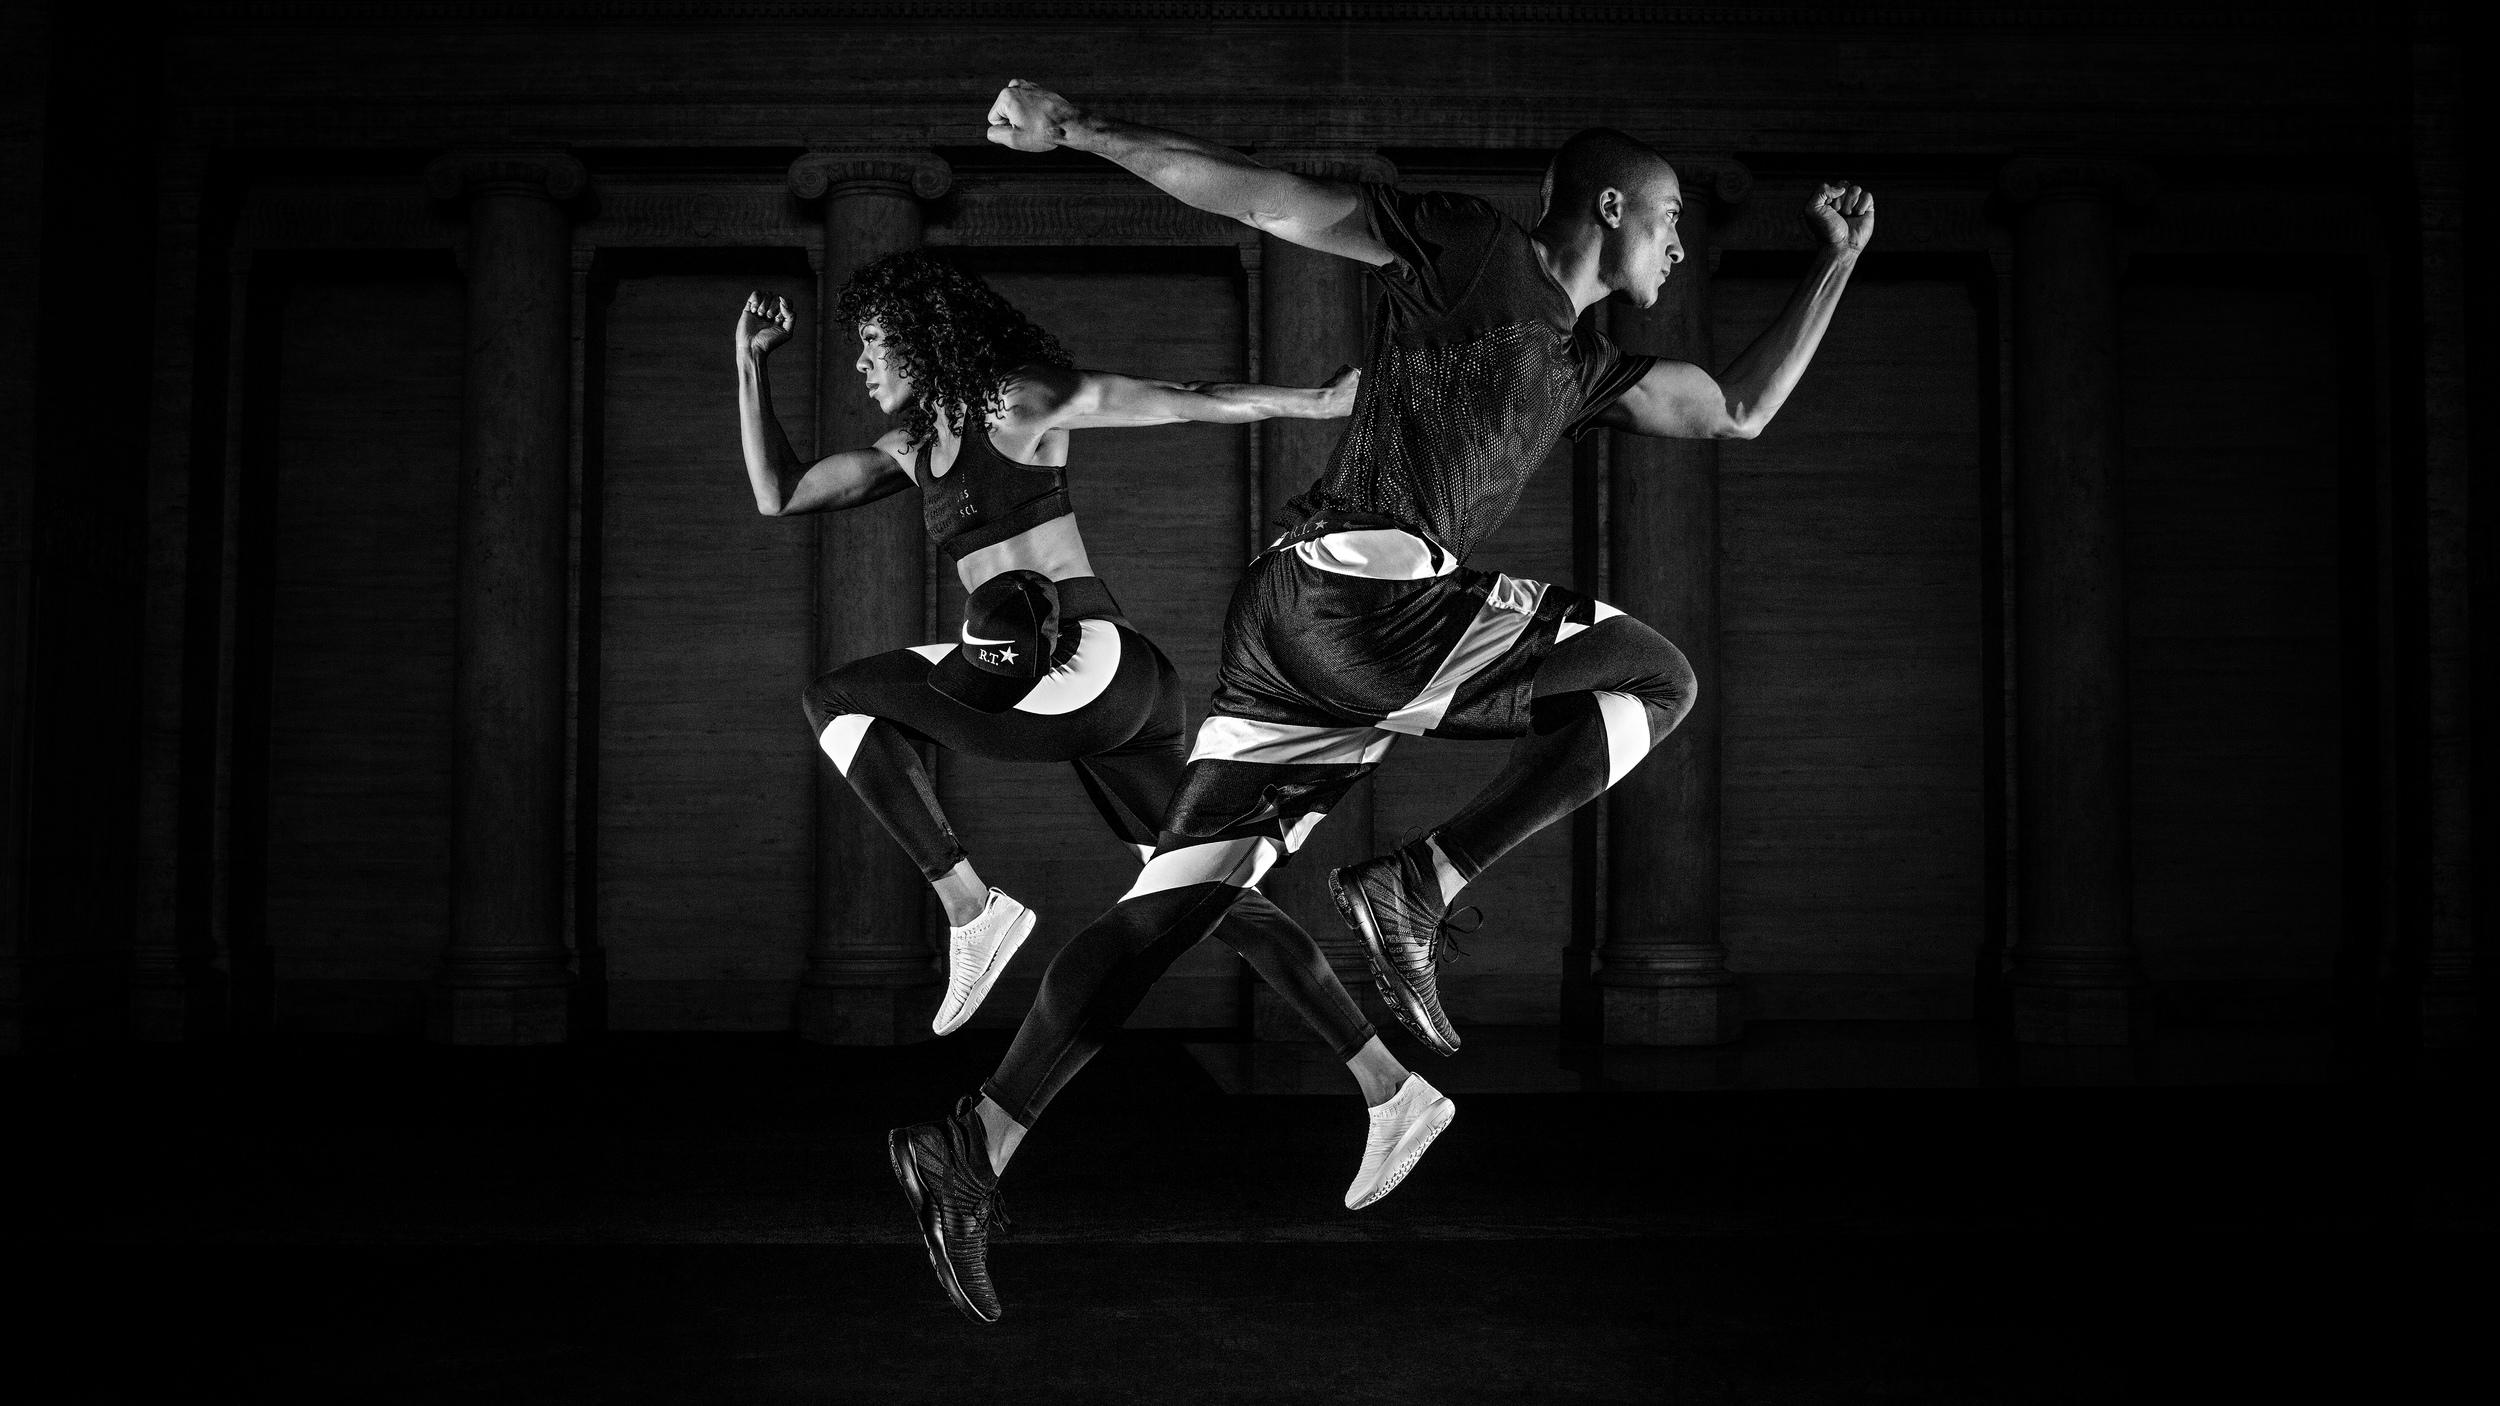 NikeLabxRT_Training_Redefined_2_54856.jpg